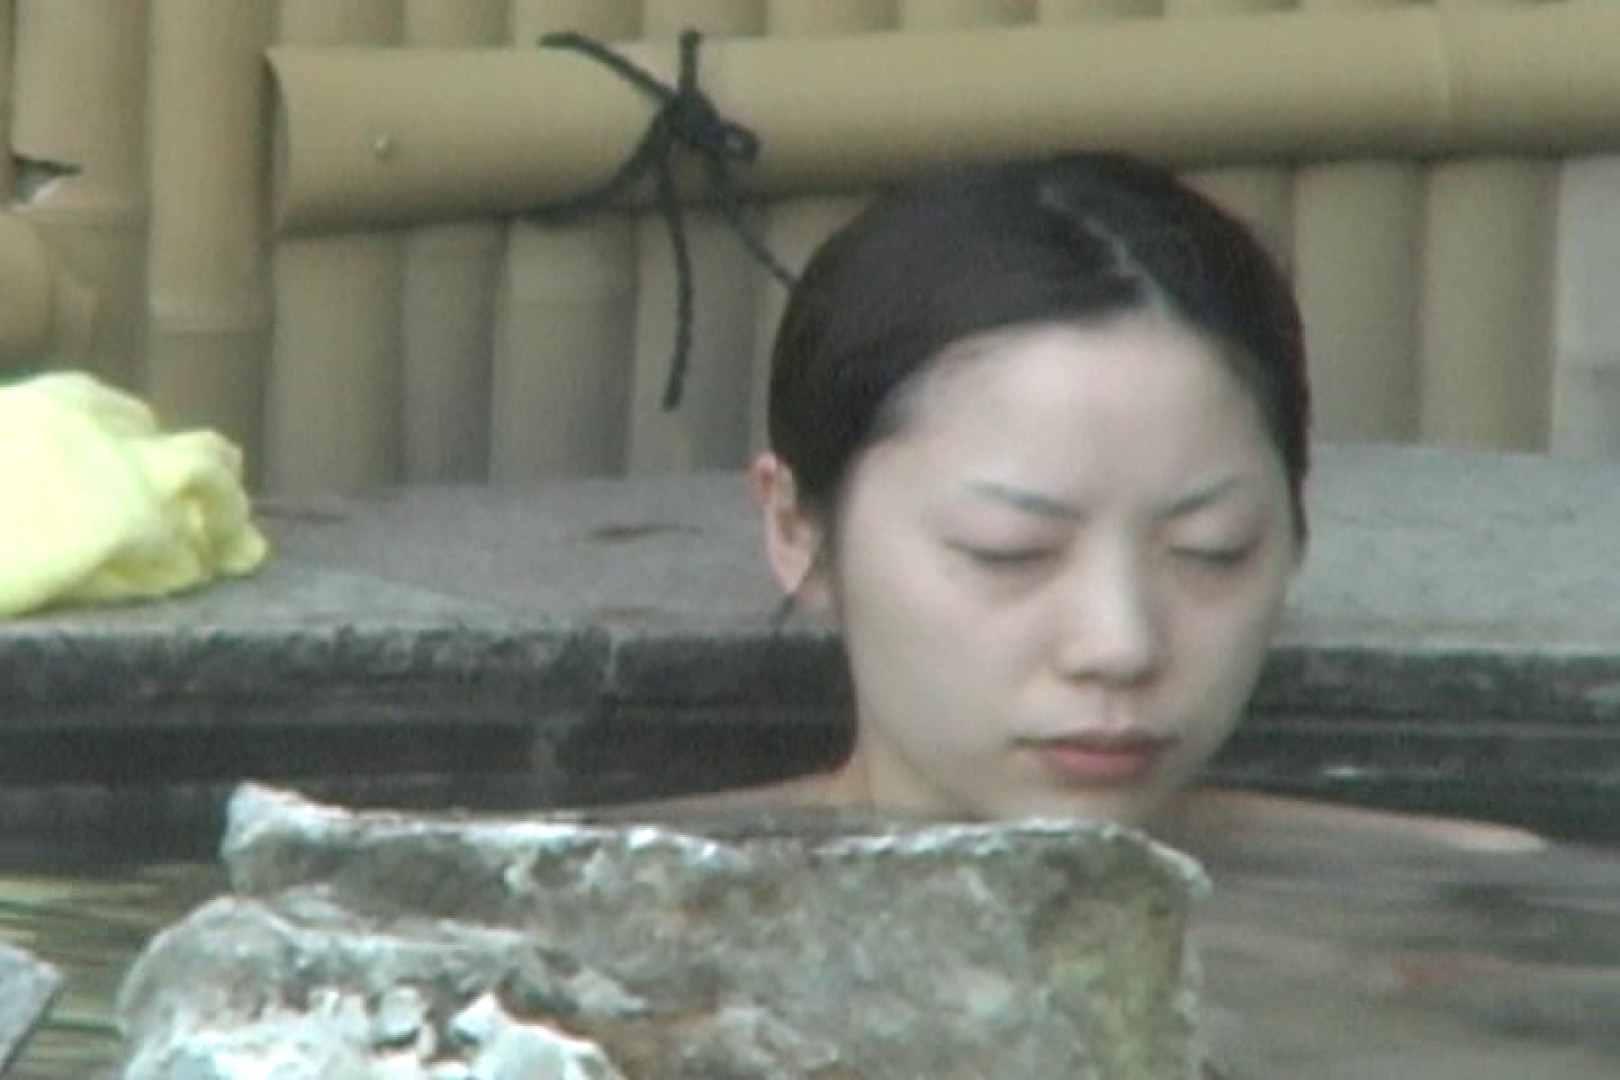 Aquaな露天風呂Vol.596 露天 覗きおまんこ画像 77画像 32